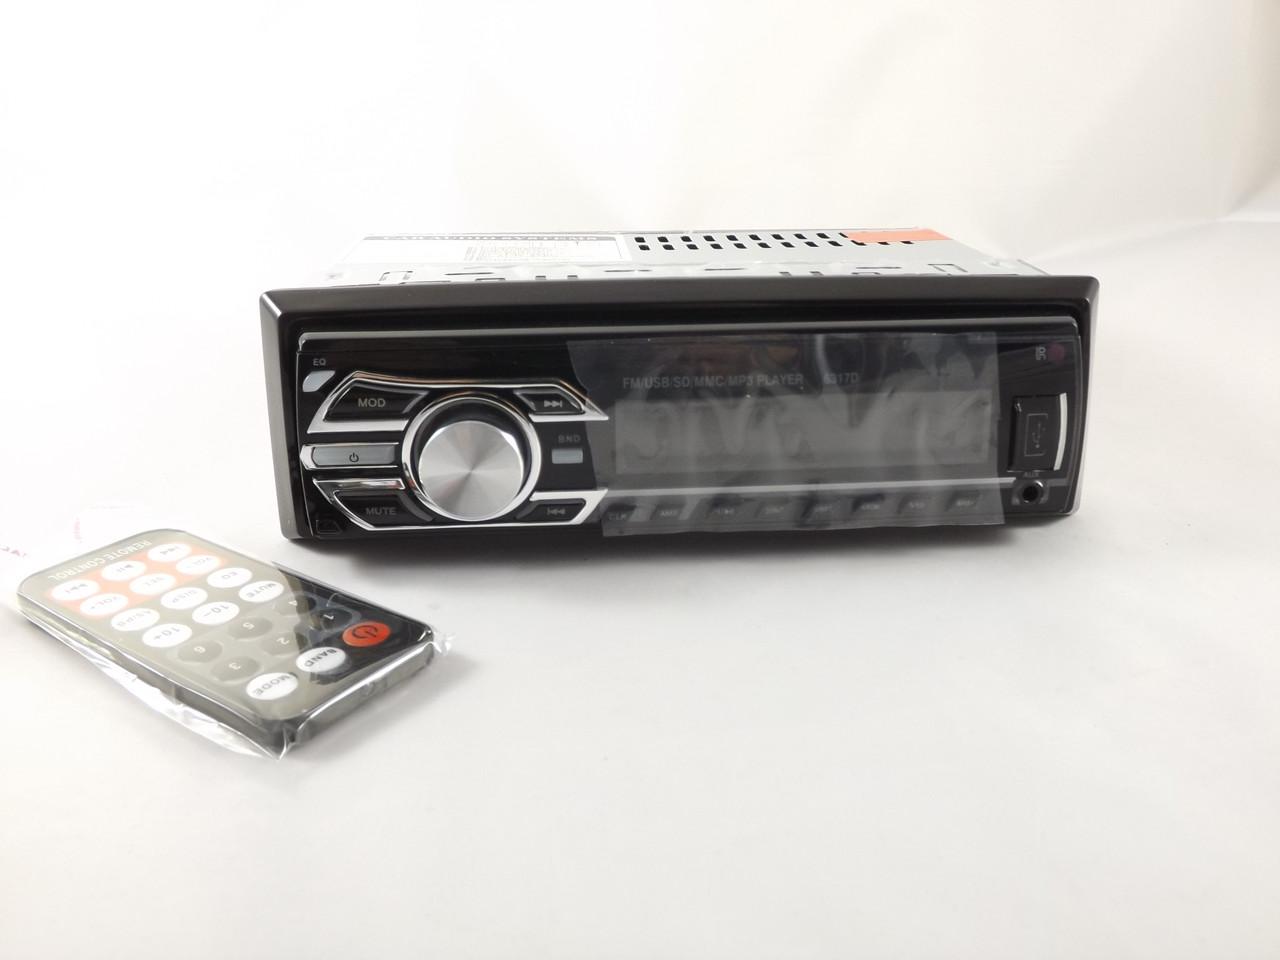 Pioneer 6317D со Съемной панелью, Usb,  Автомагнитола с RGB подсветкой +Fm+Aux+ пульт+ПОДАРОК!